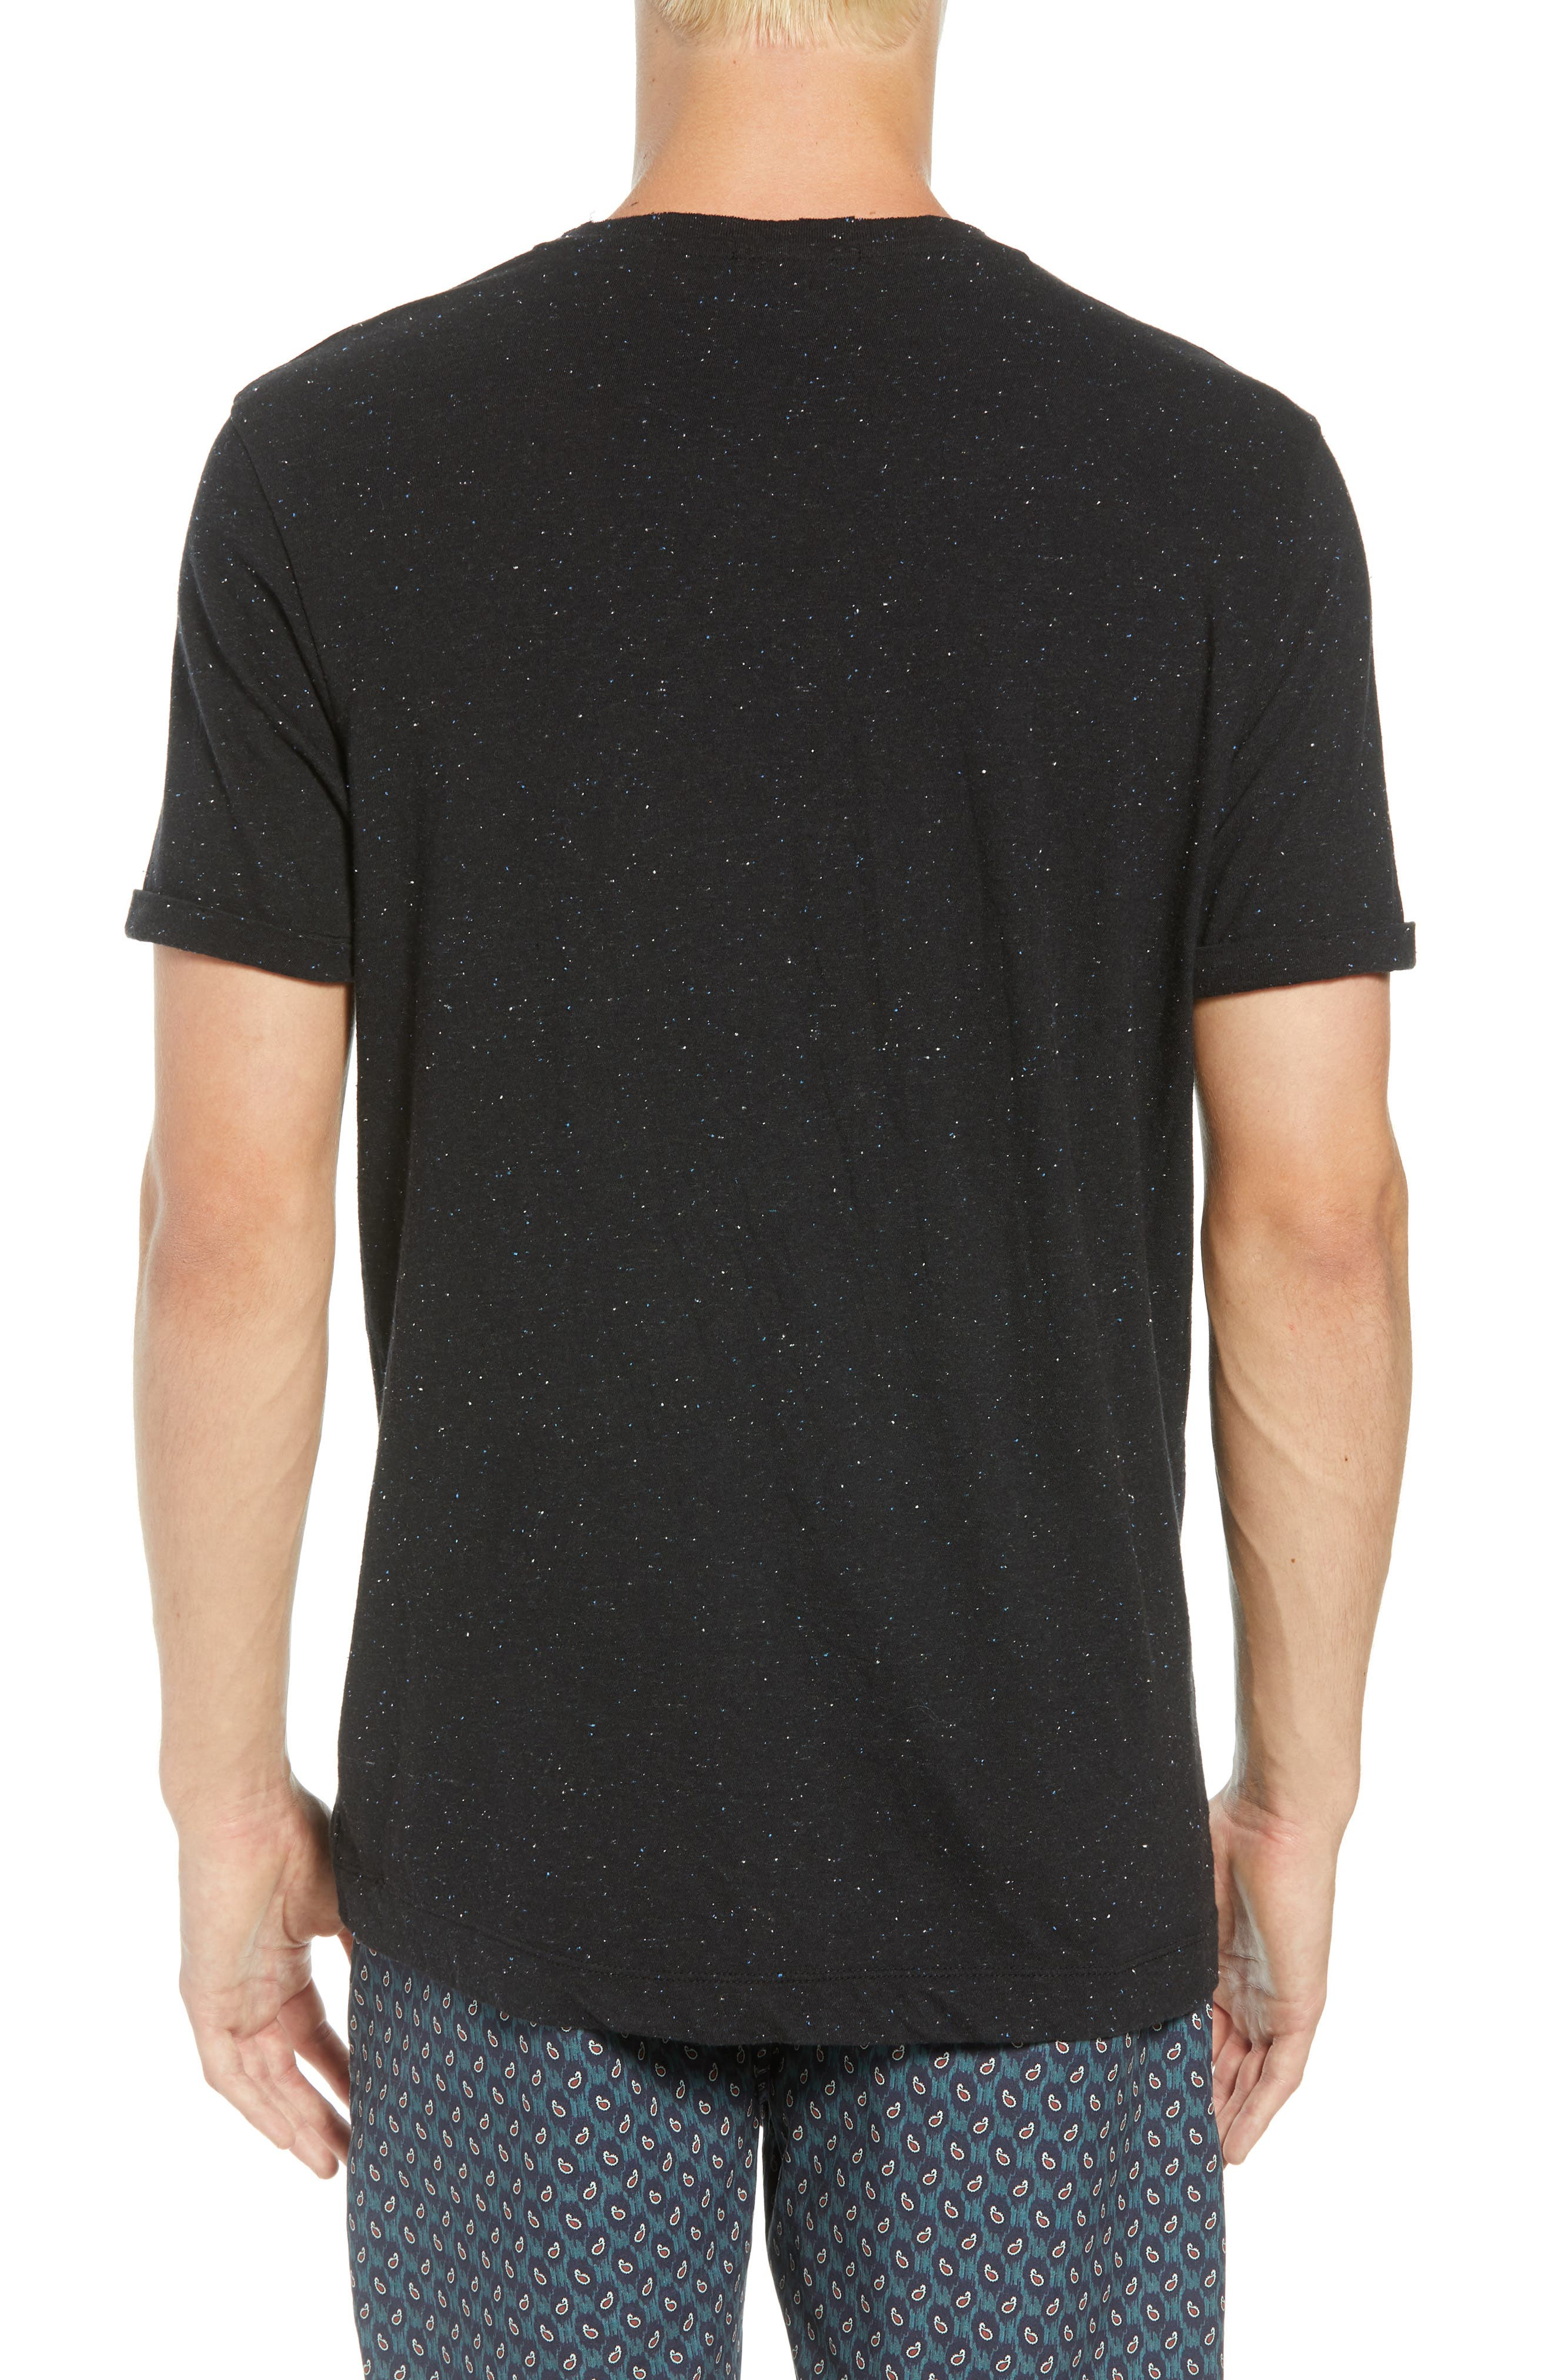 Nep Jersey Pocket T-Shirt,                             Alternate thumbnail 2, color,                             BLACK MELANGE